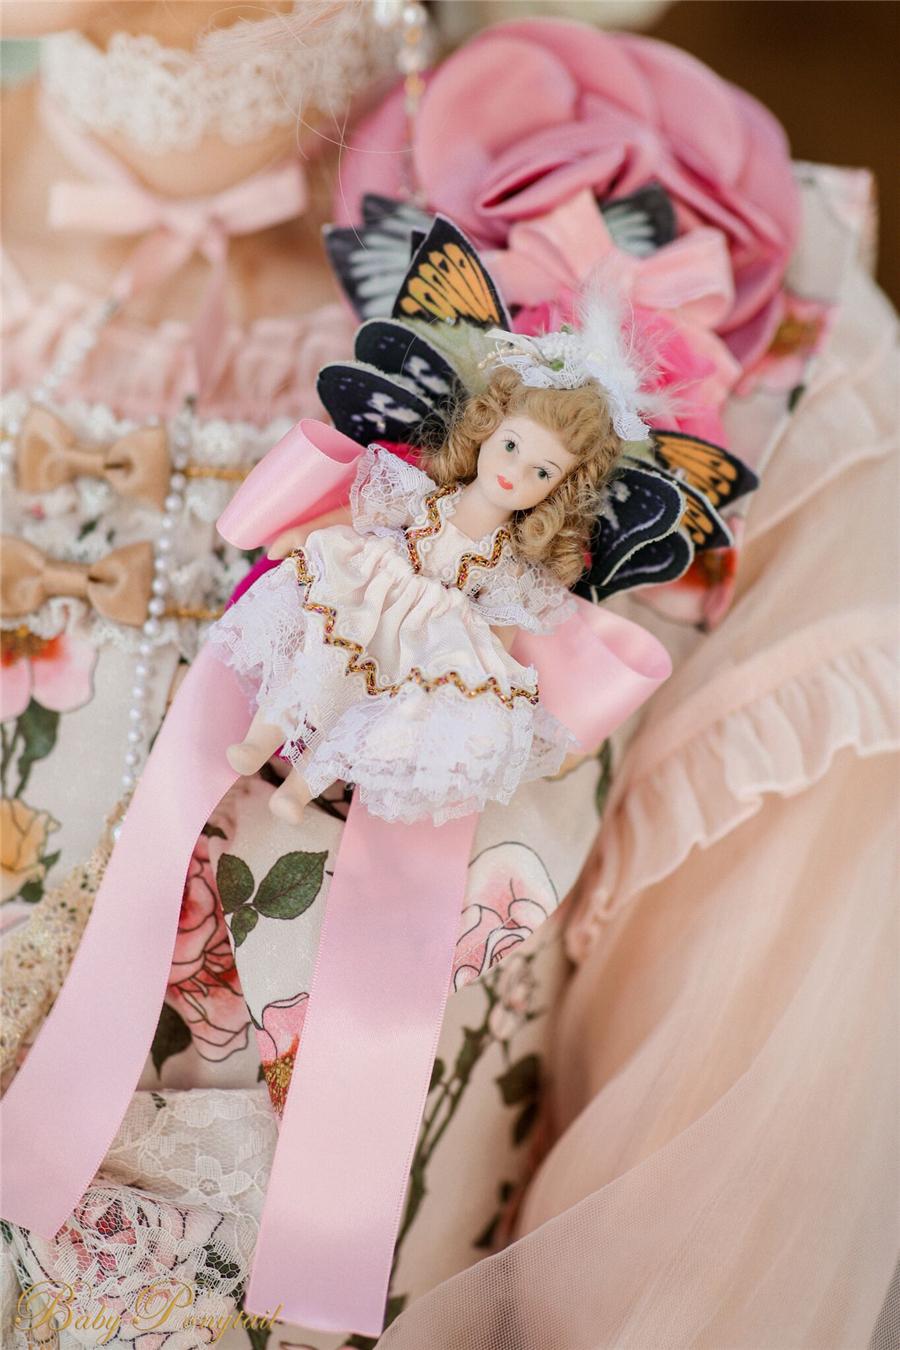 Polly's Garden of Dreams_Model Photo_Ivory JSK_Kaka_02.jpg